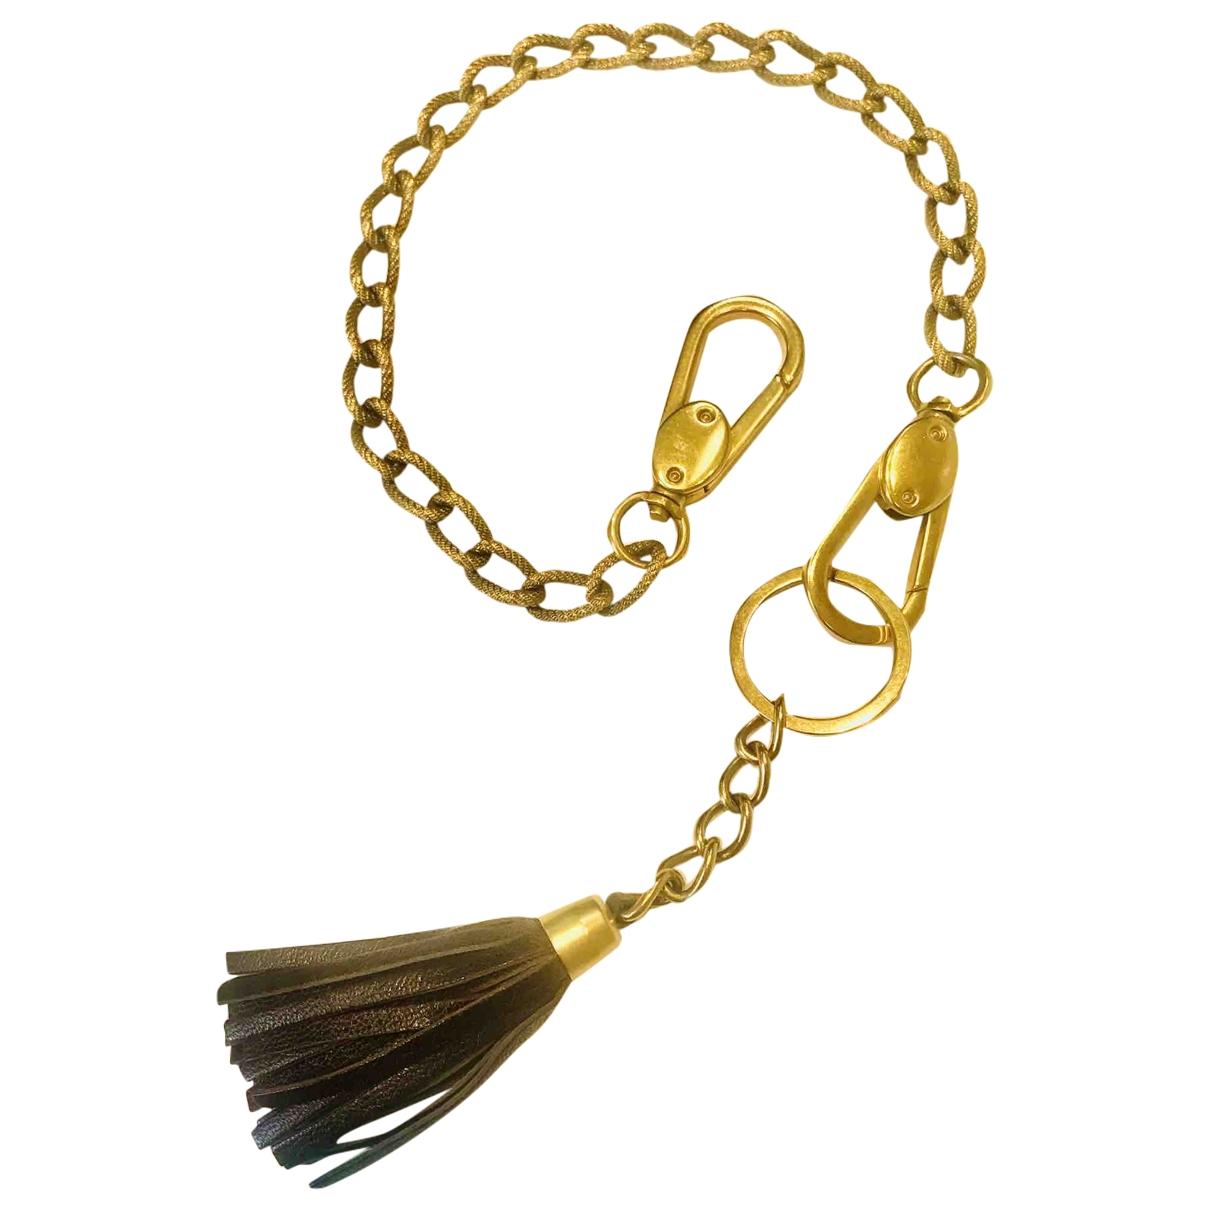 Dolce & Gabbana \N Gold Metal belt for Women S International